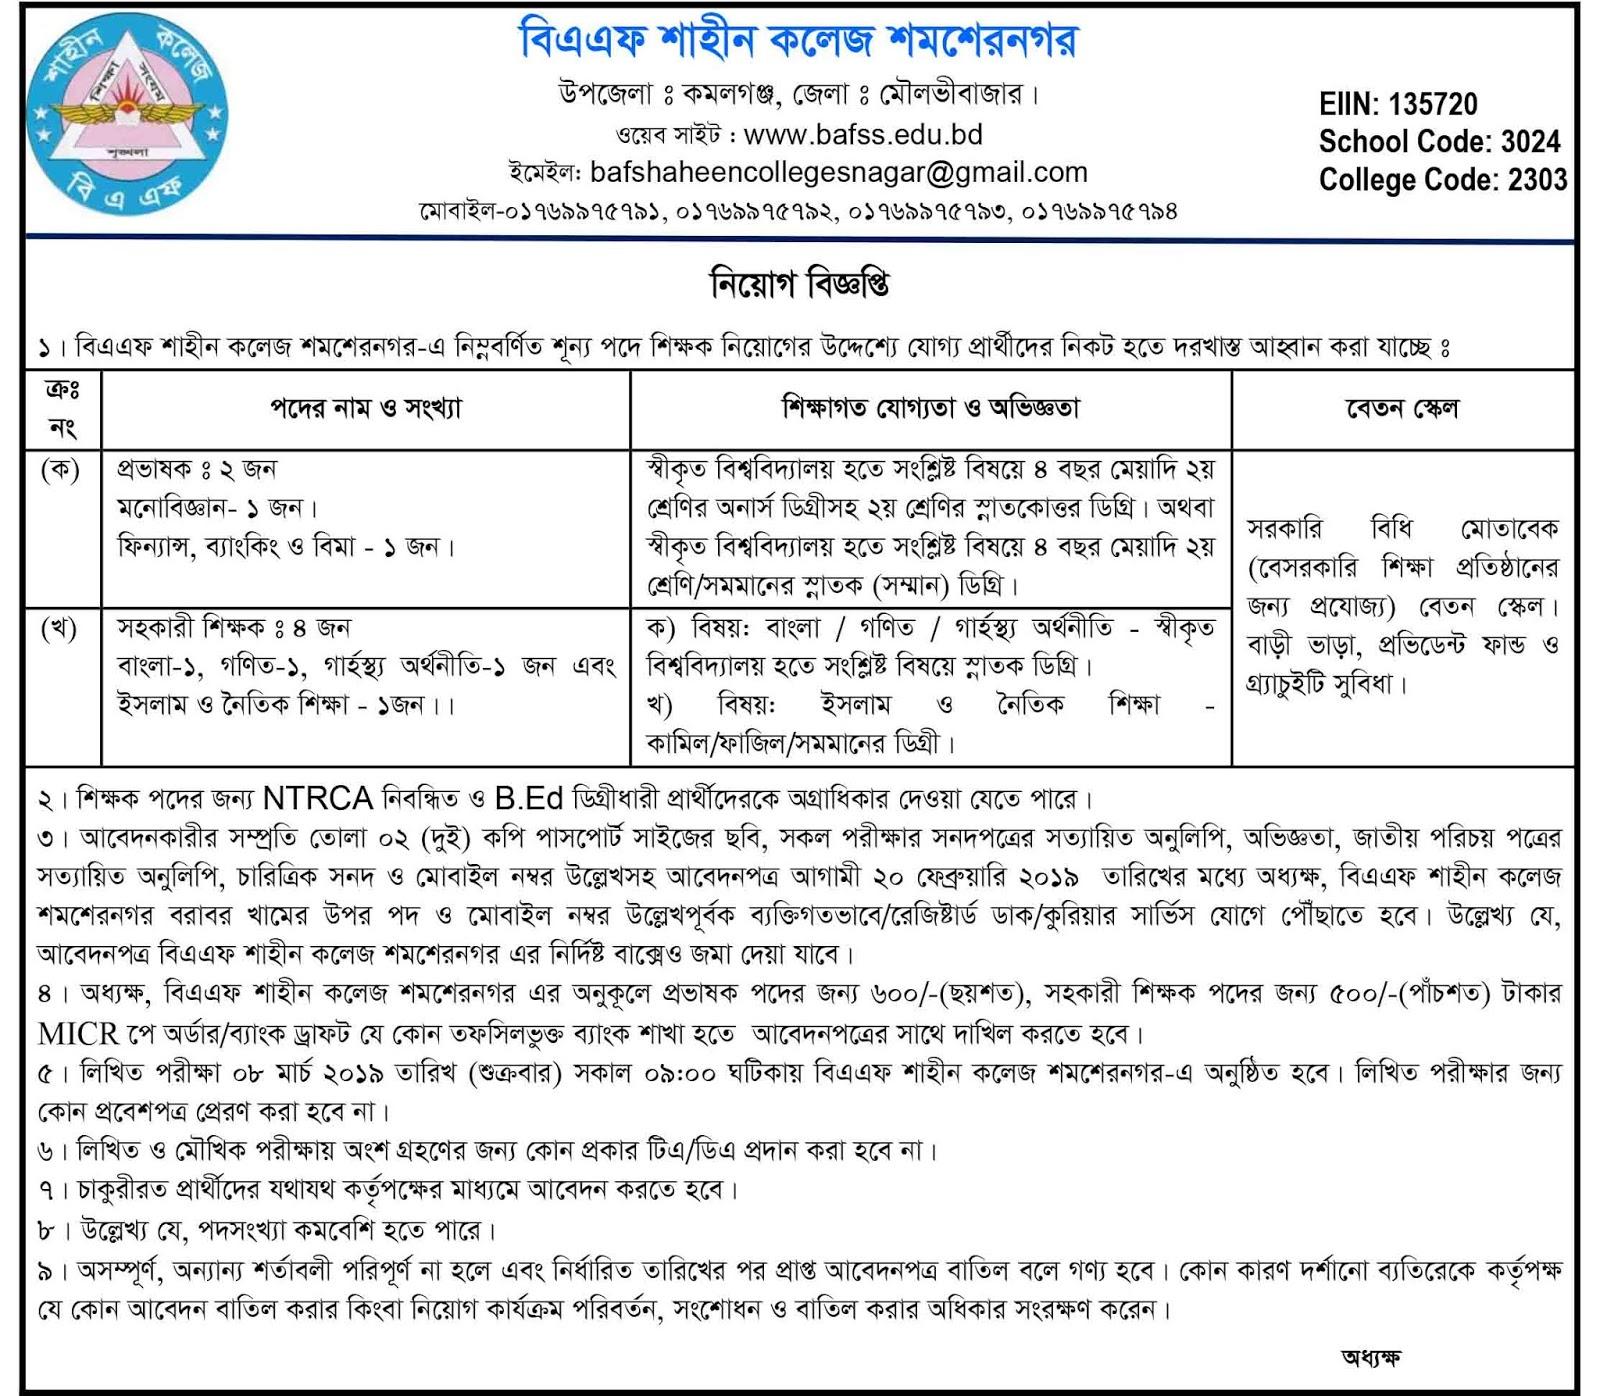 BAF Shaheen College Shamshernagar Job Circular 2019